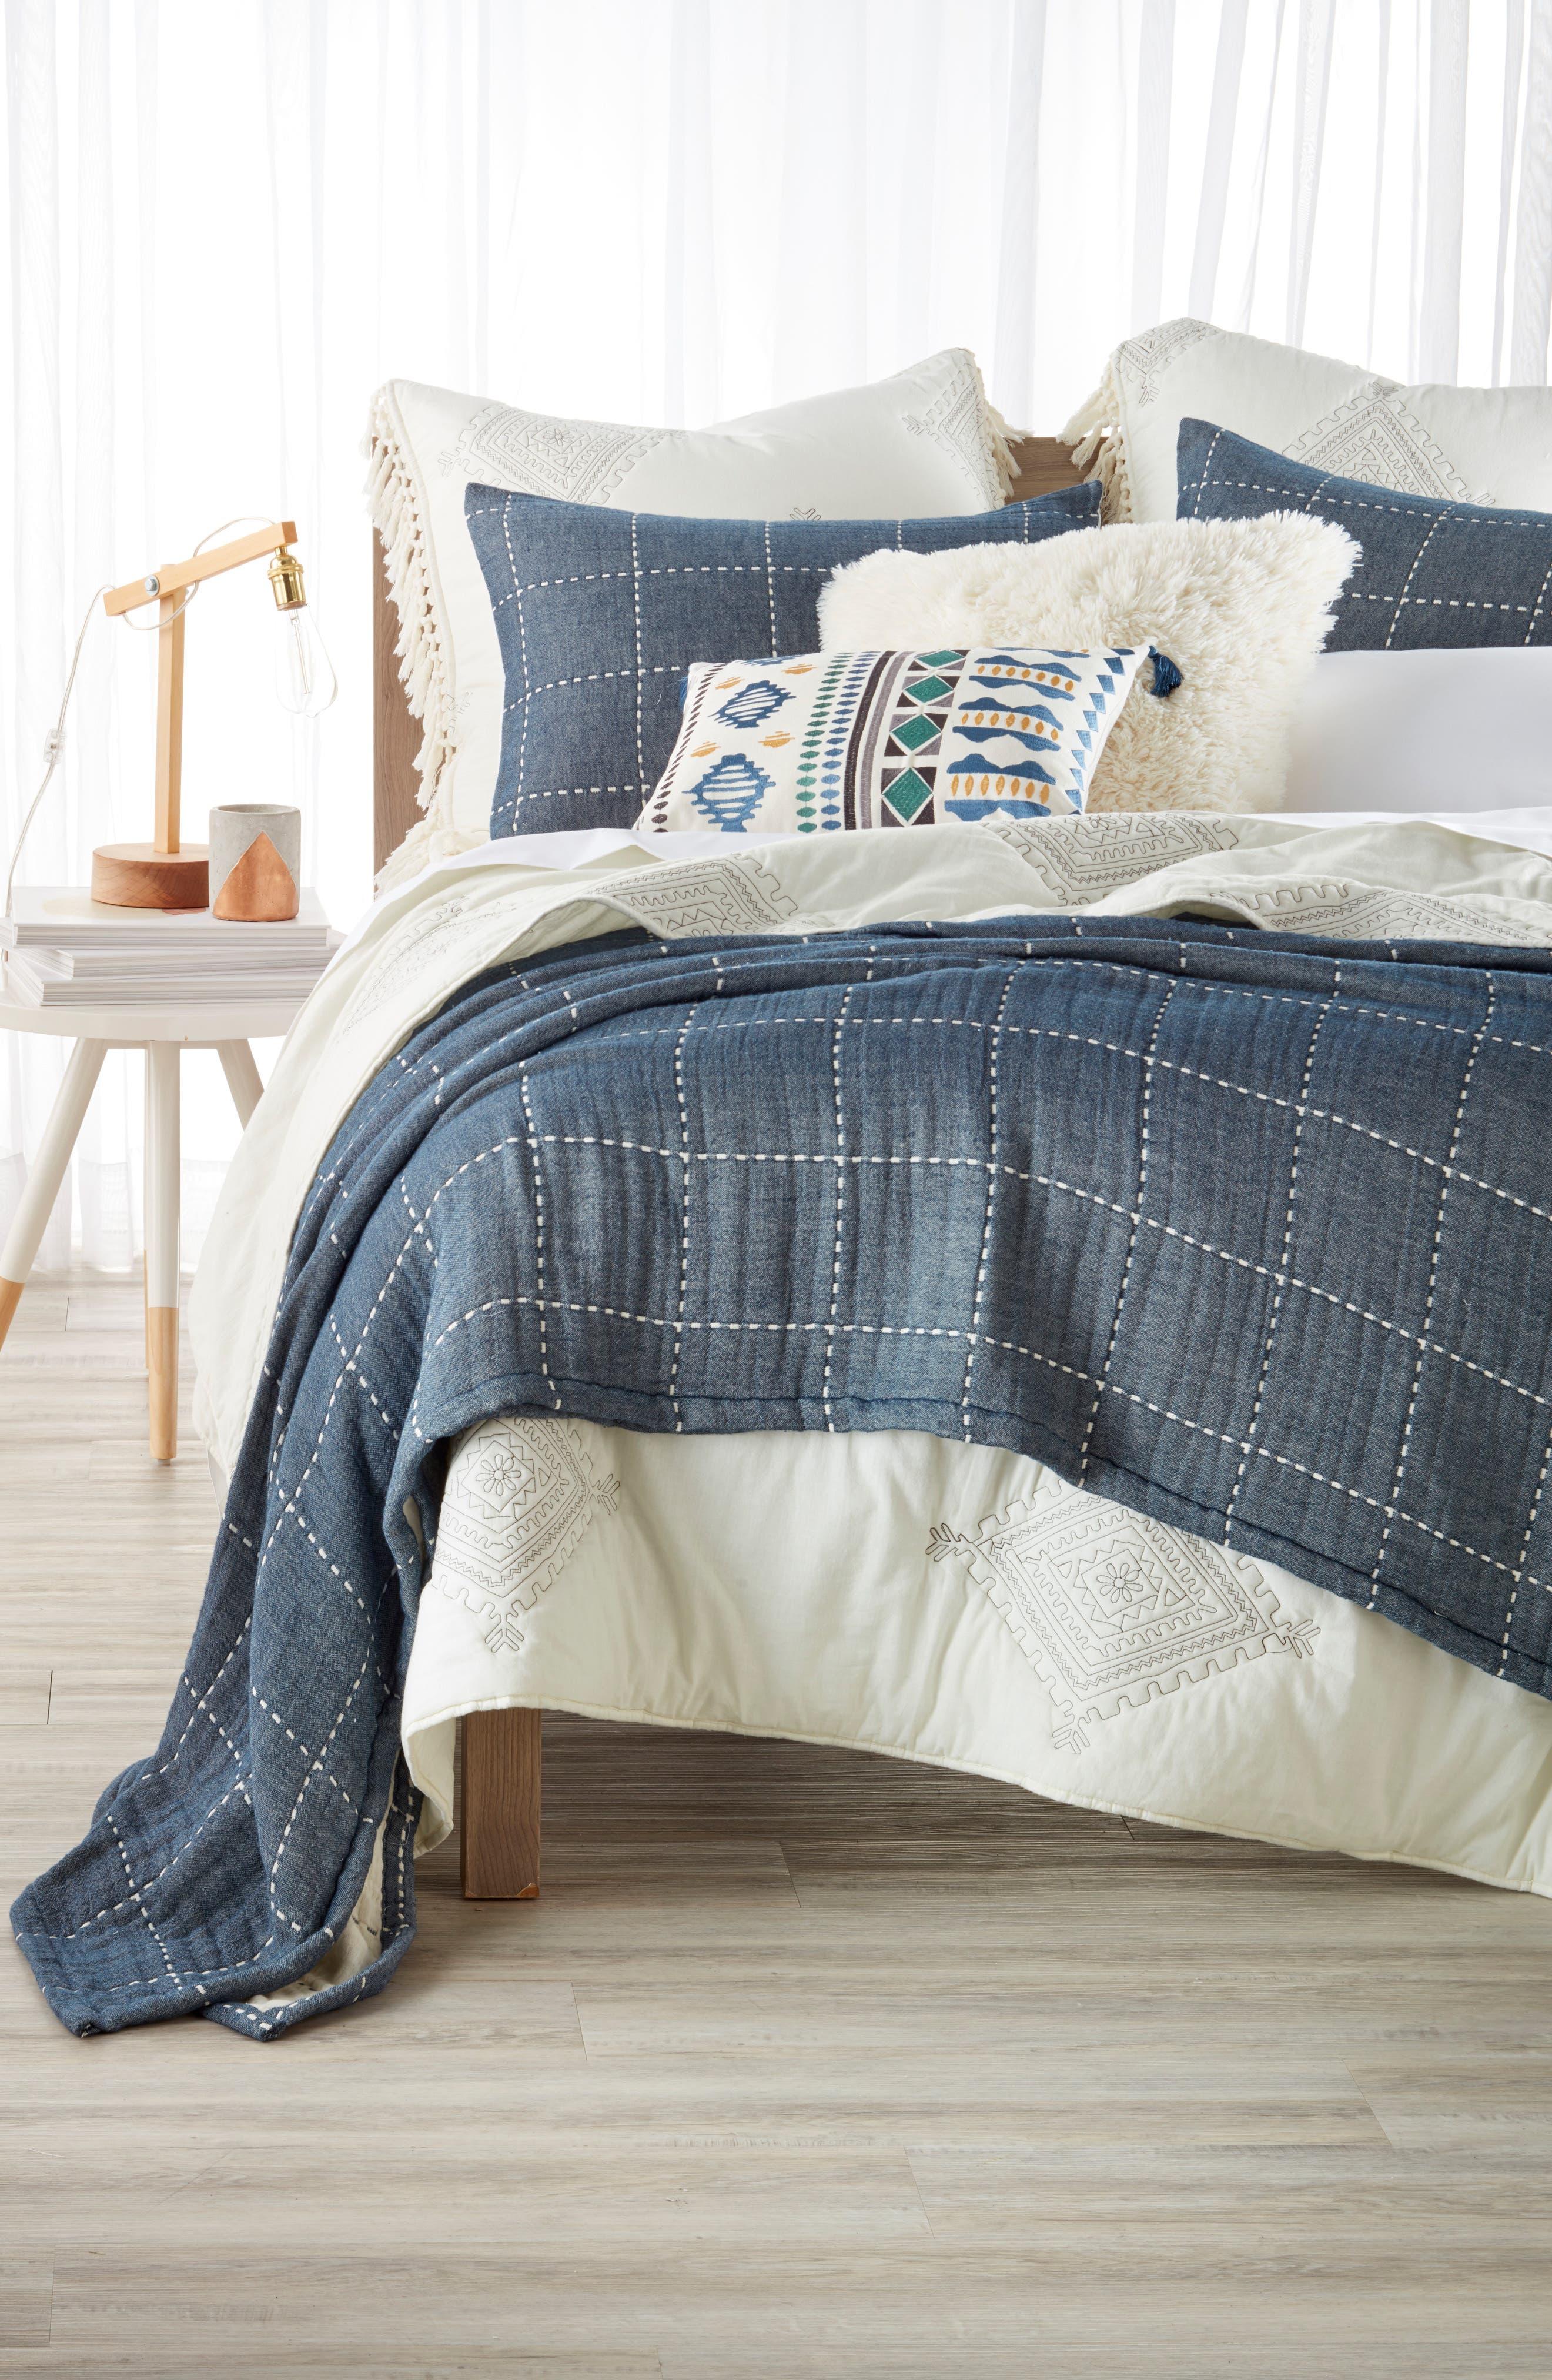 Levtex Zira Quilted Comforter & Windowpane Coverlet Bedding Collection